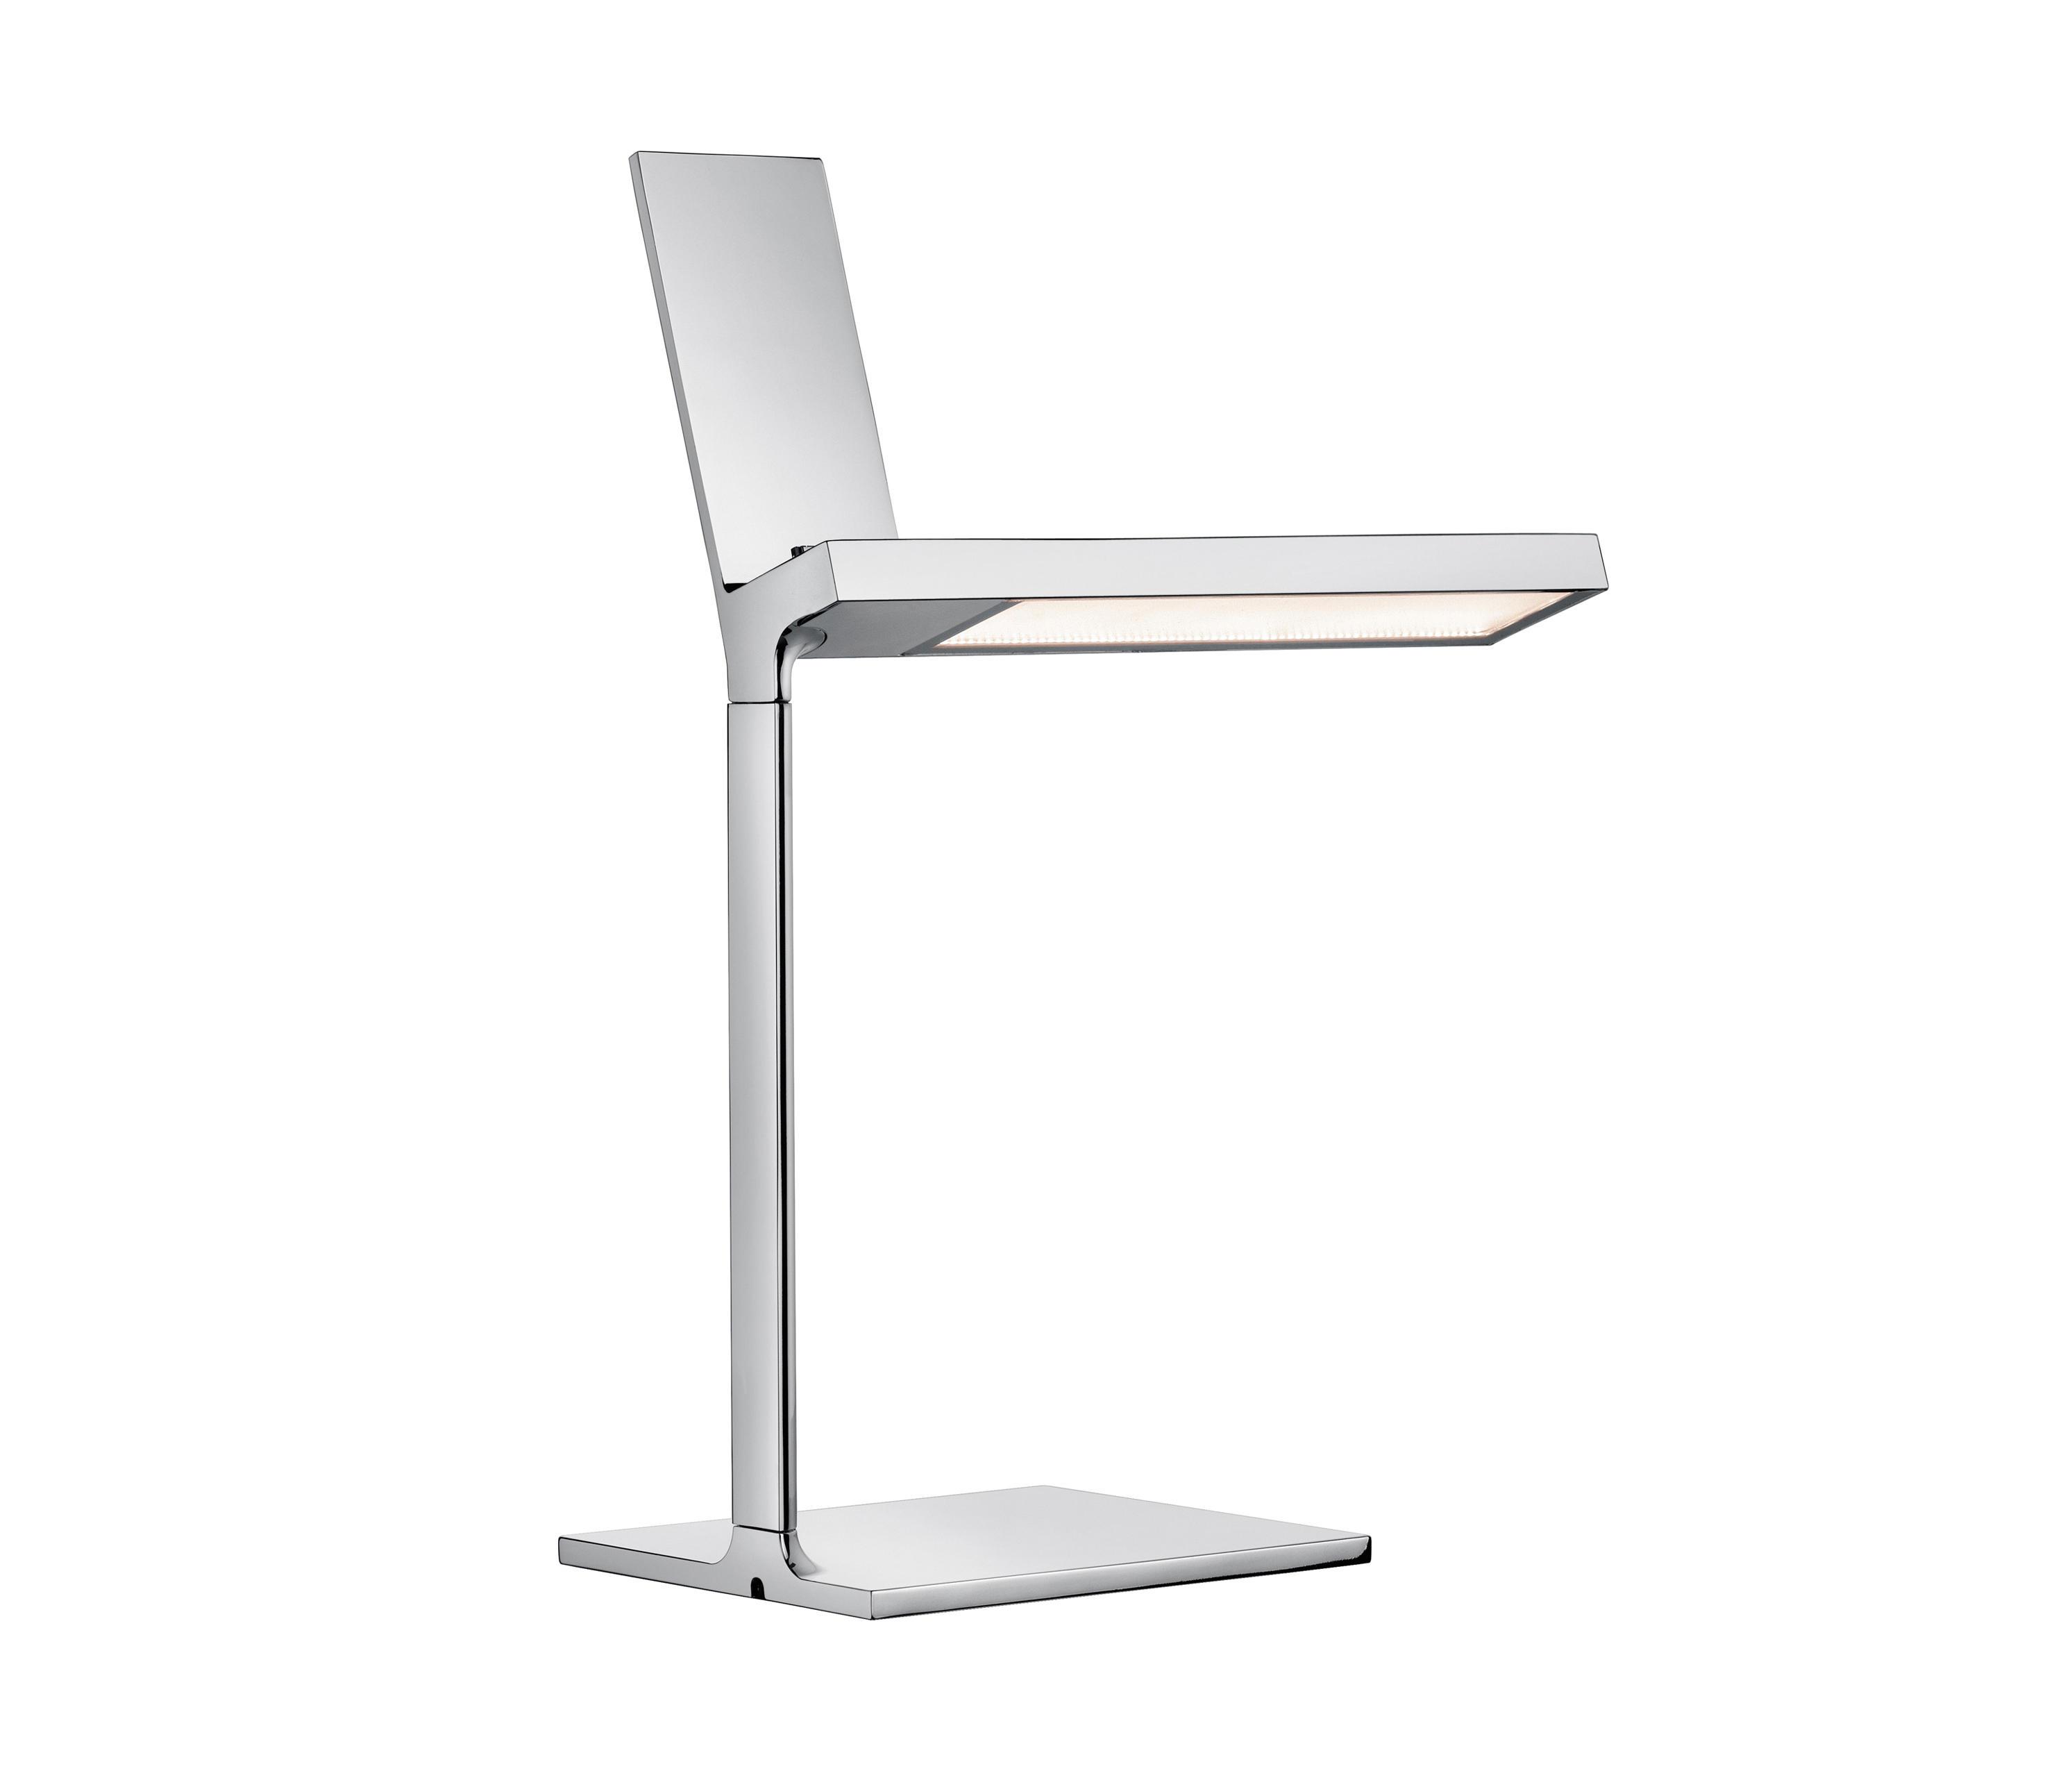 Philippe Starck Lighting Inside Du0027elight By Flos Table Lights Du0027elight From Architonic